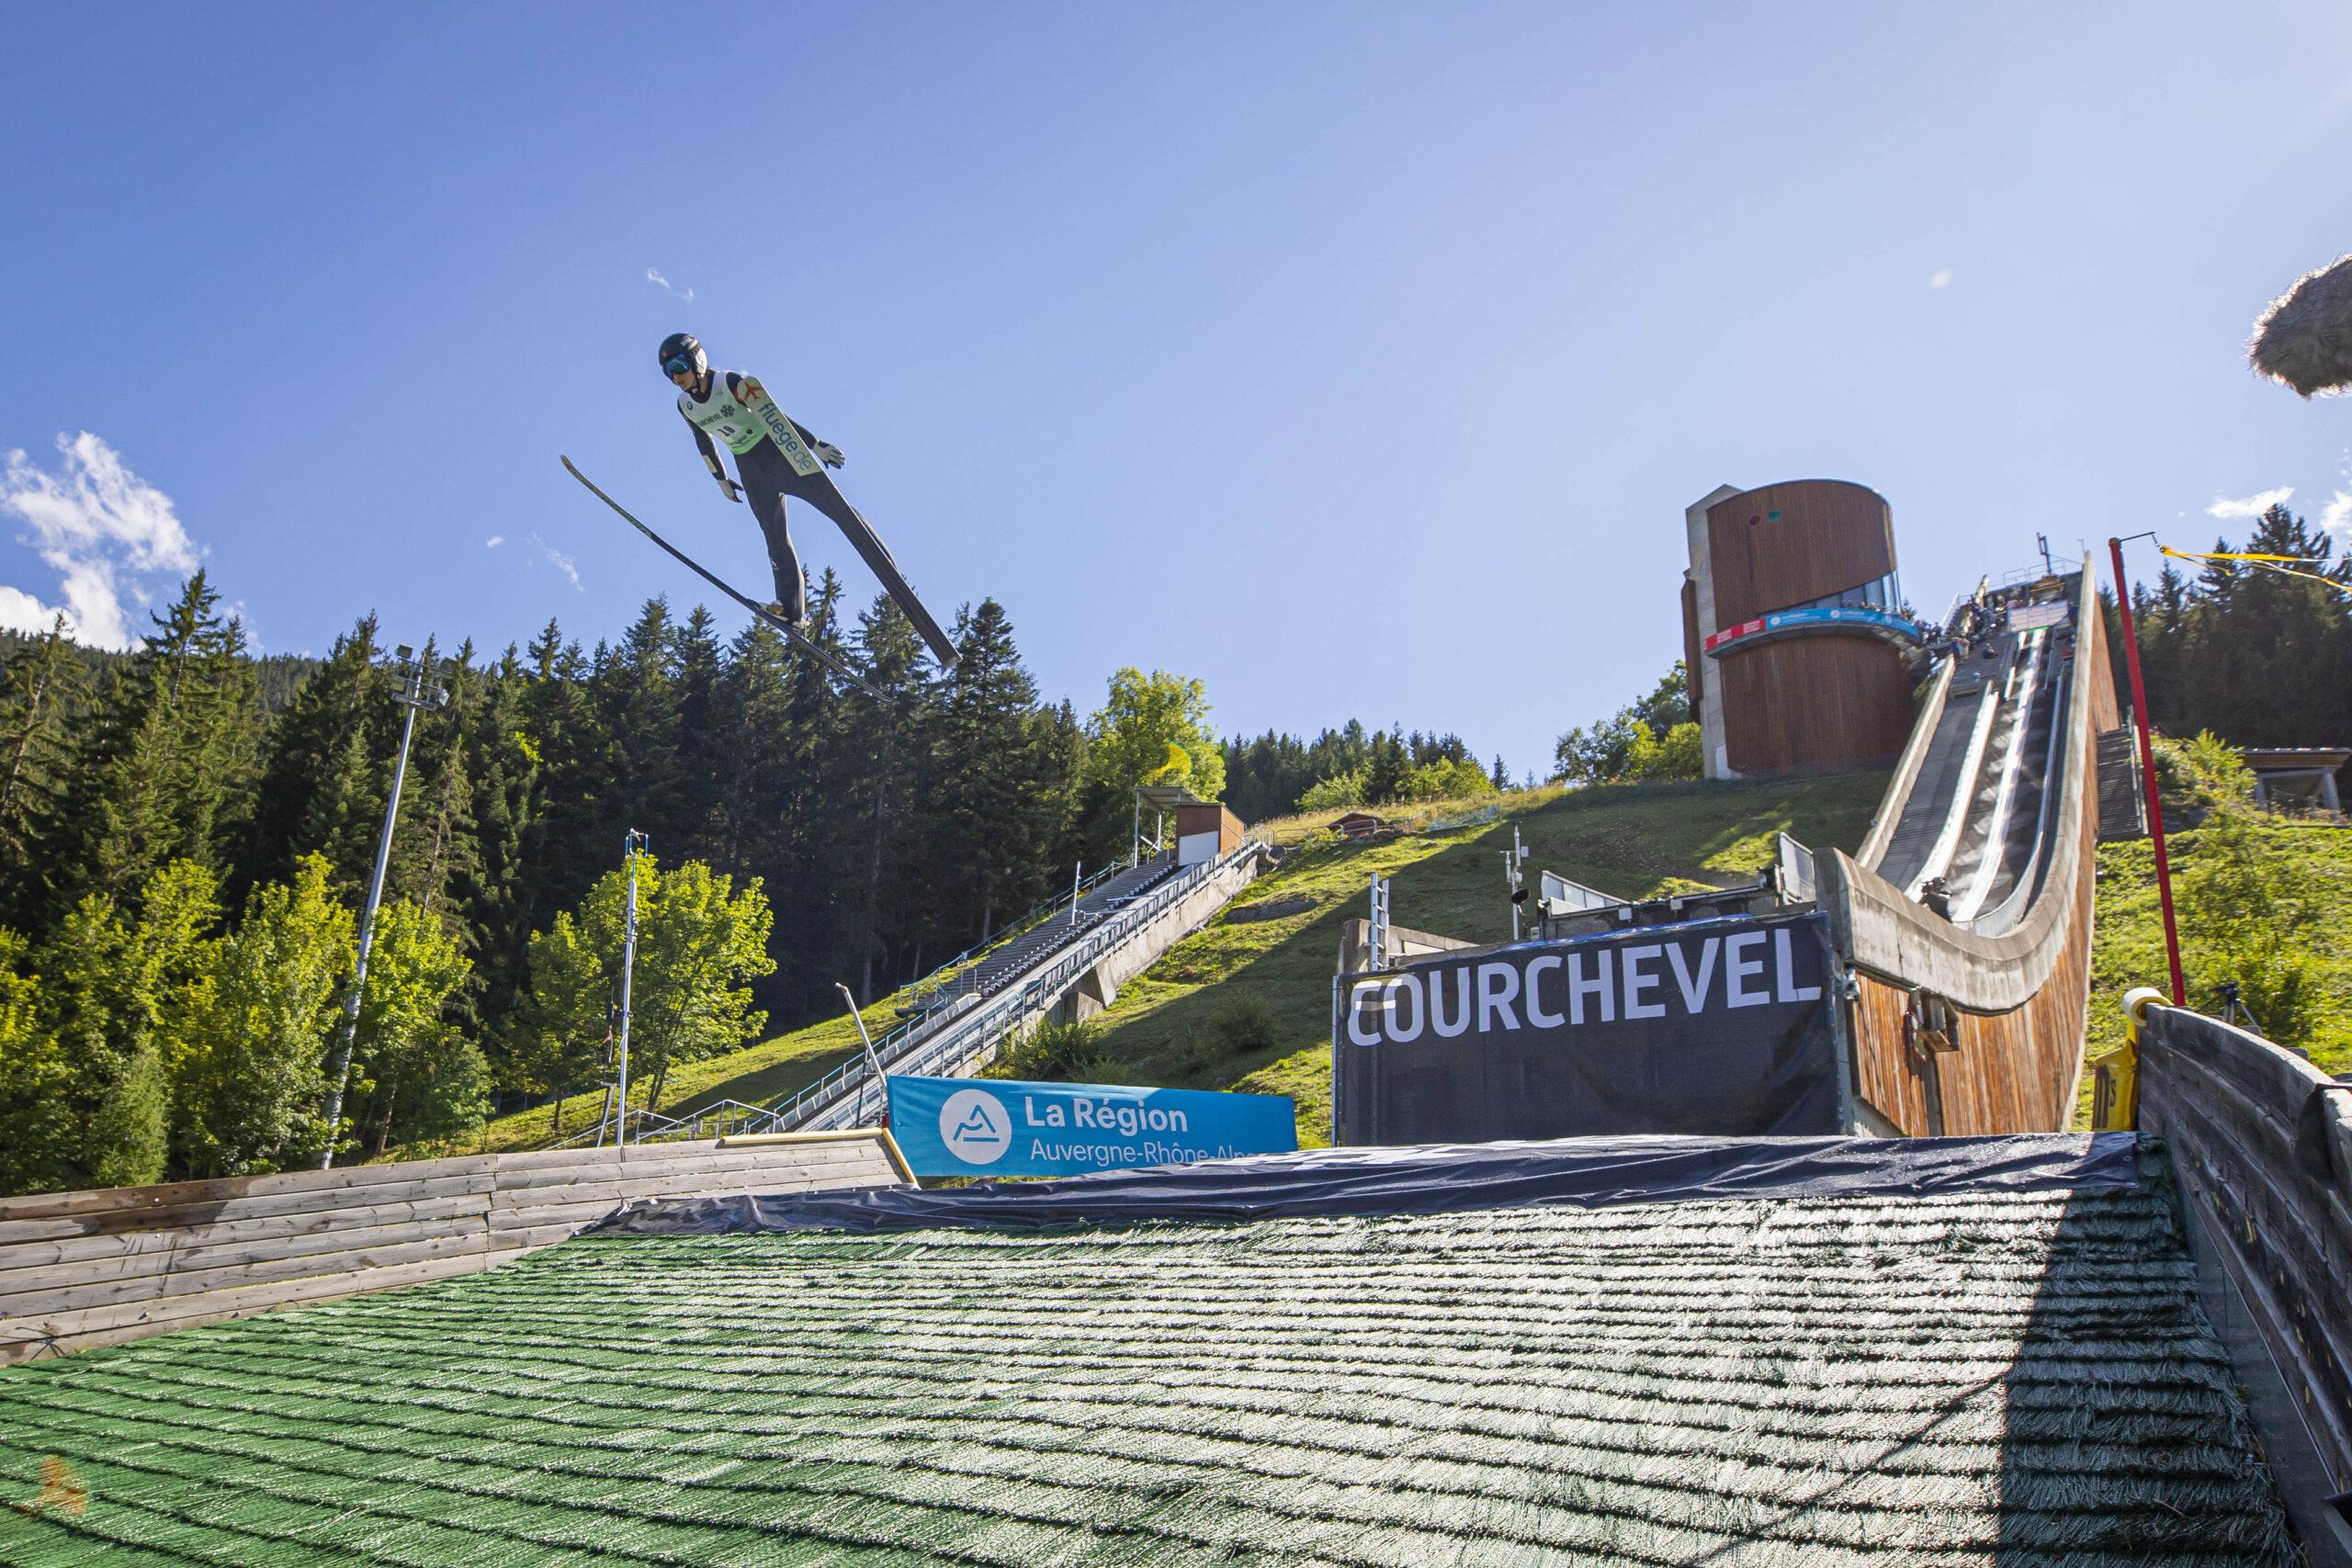 Copyright - Courchevel Tourisme